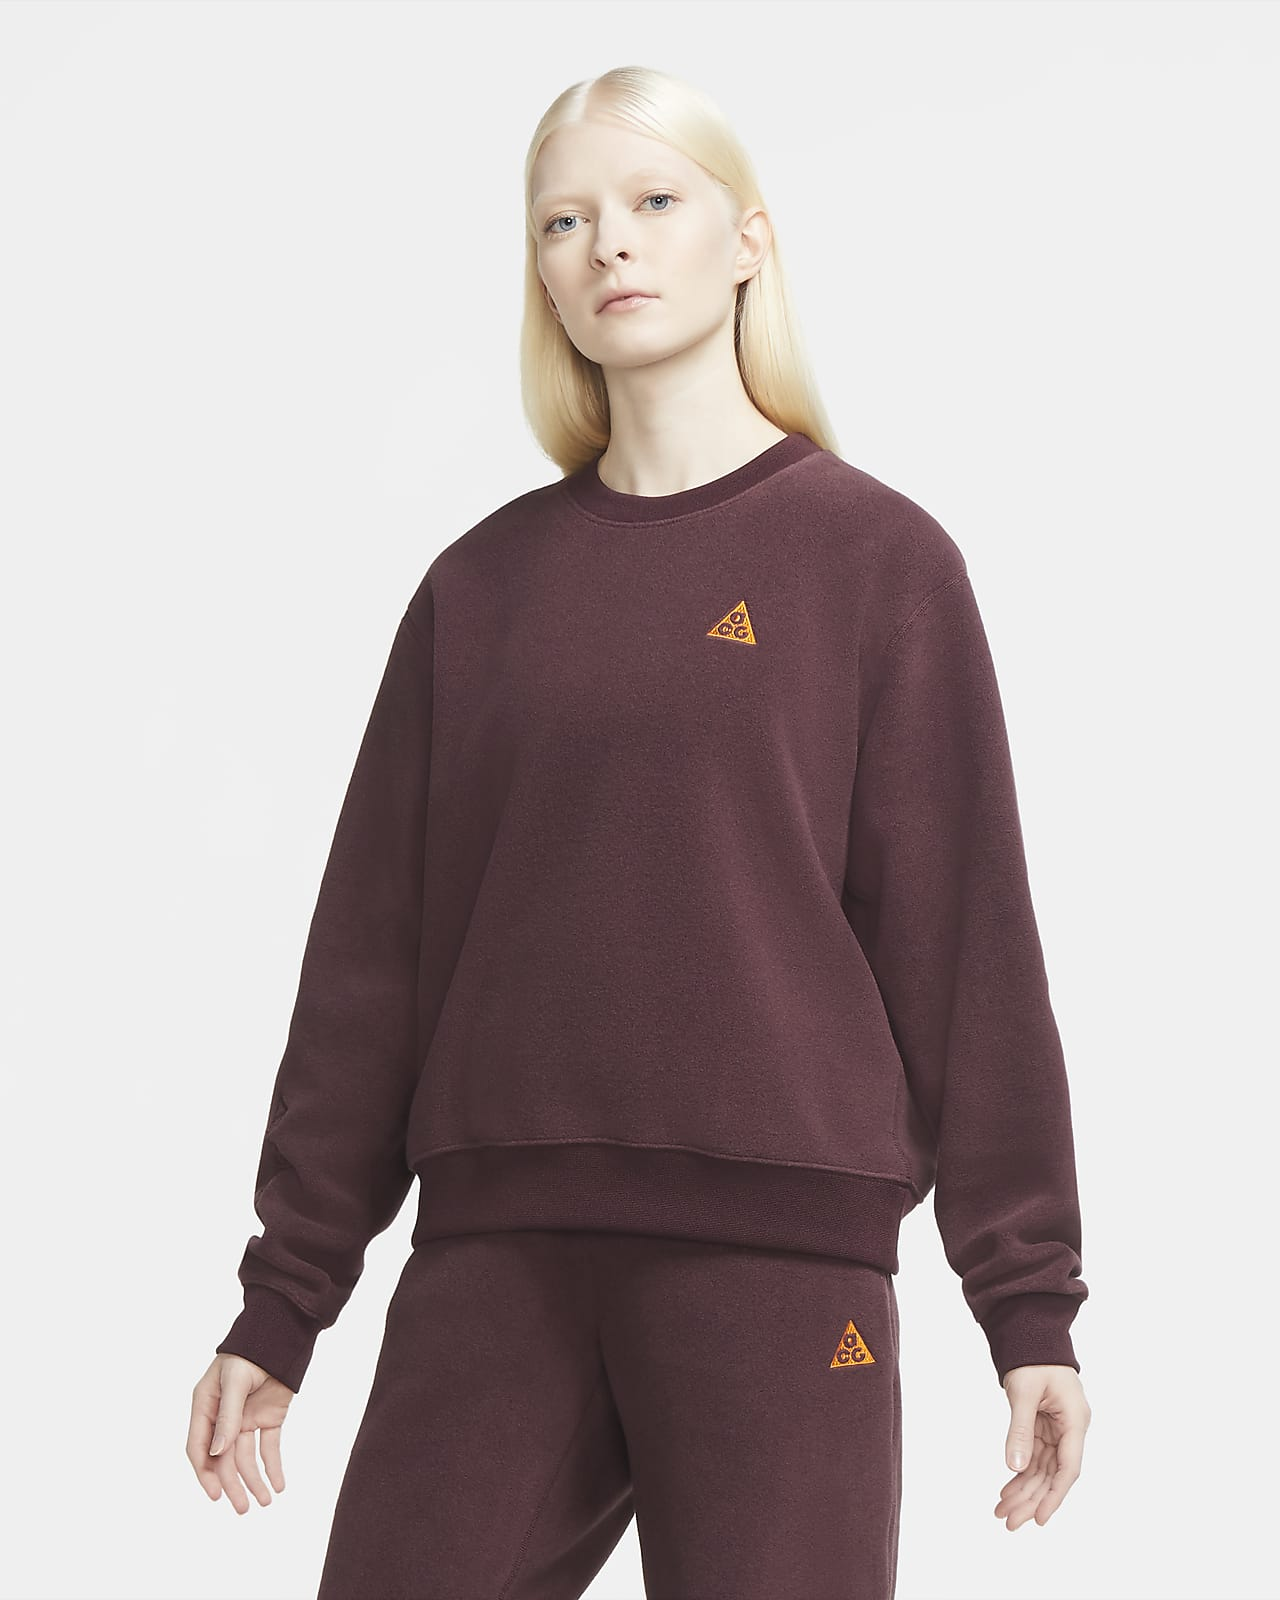 Nike ACG Polartec® 'Wolf Tree' Women's Crew Sweatshirt